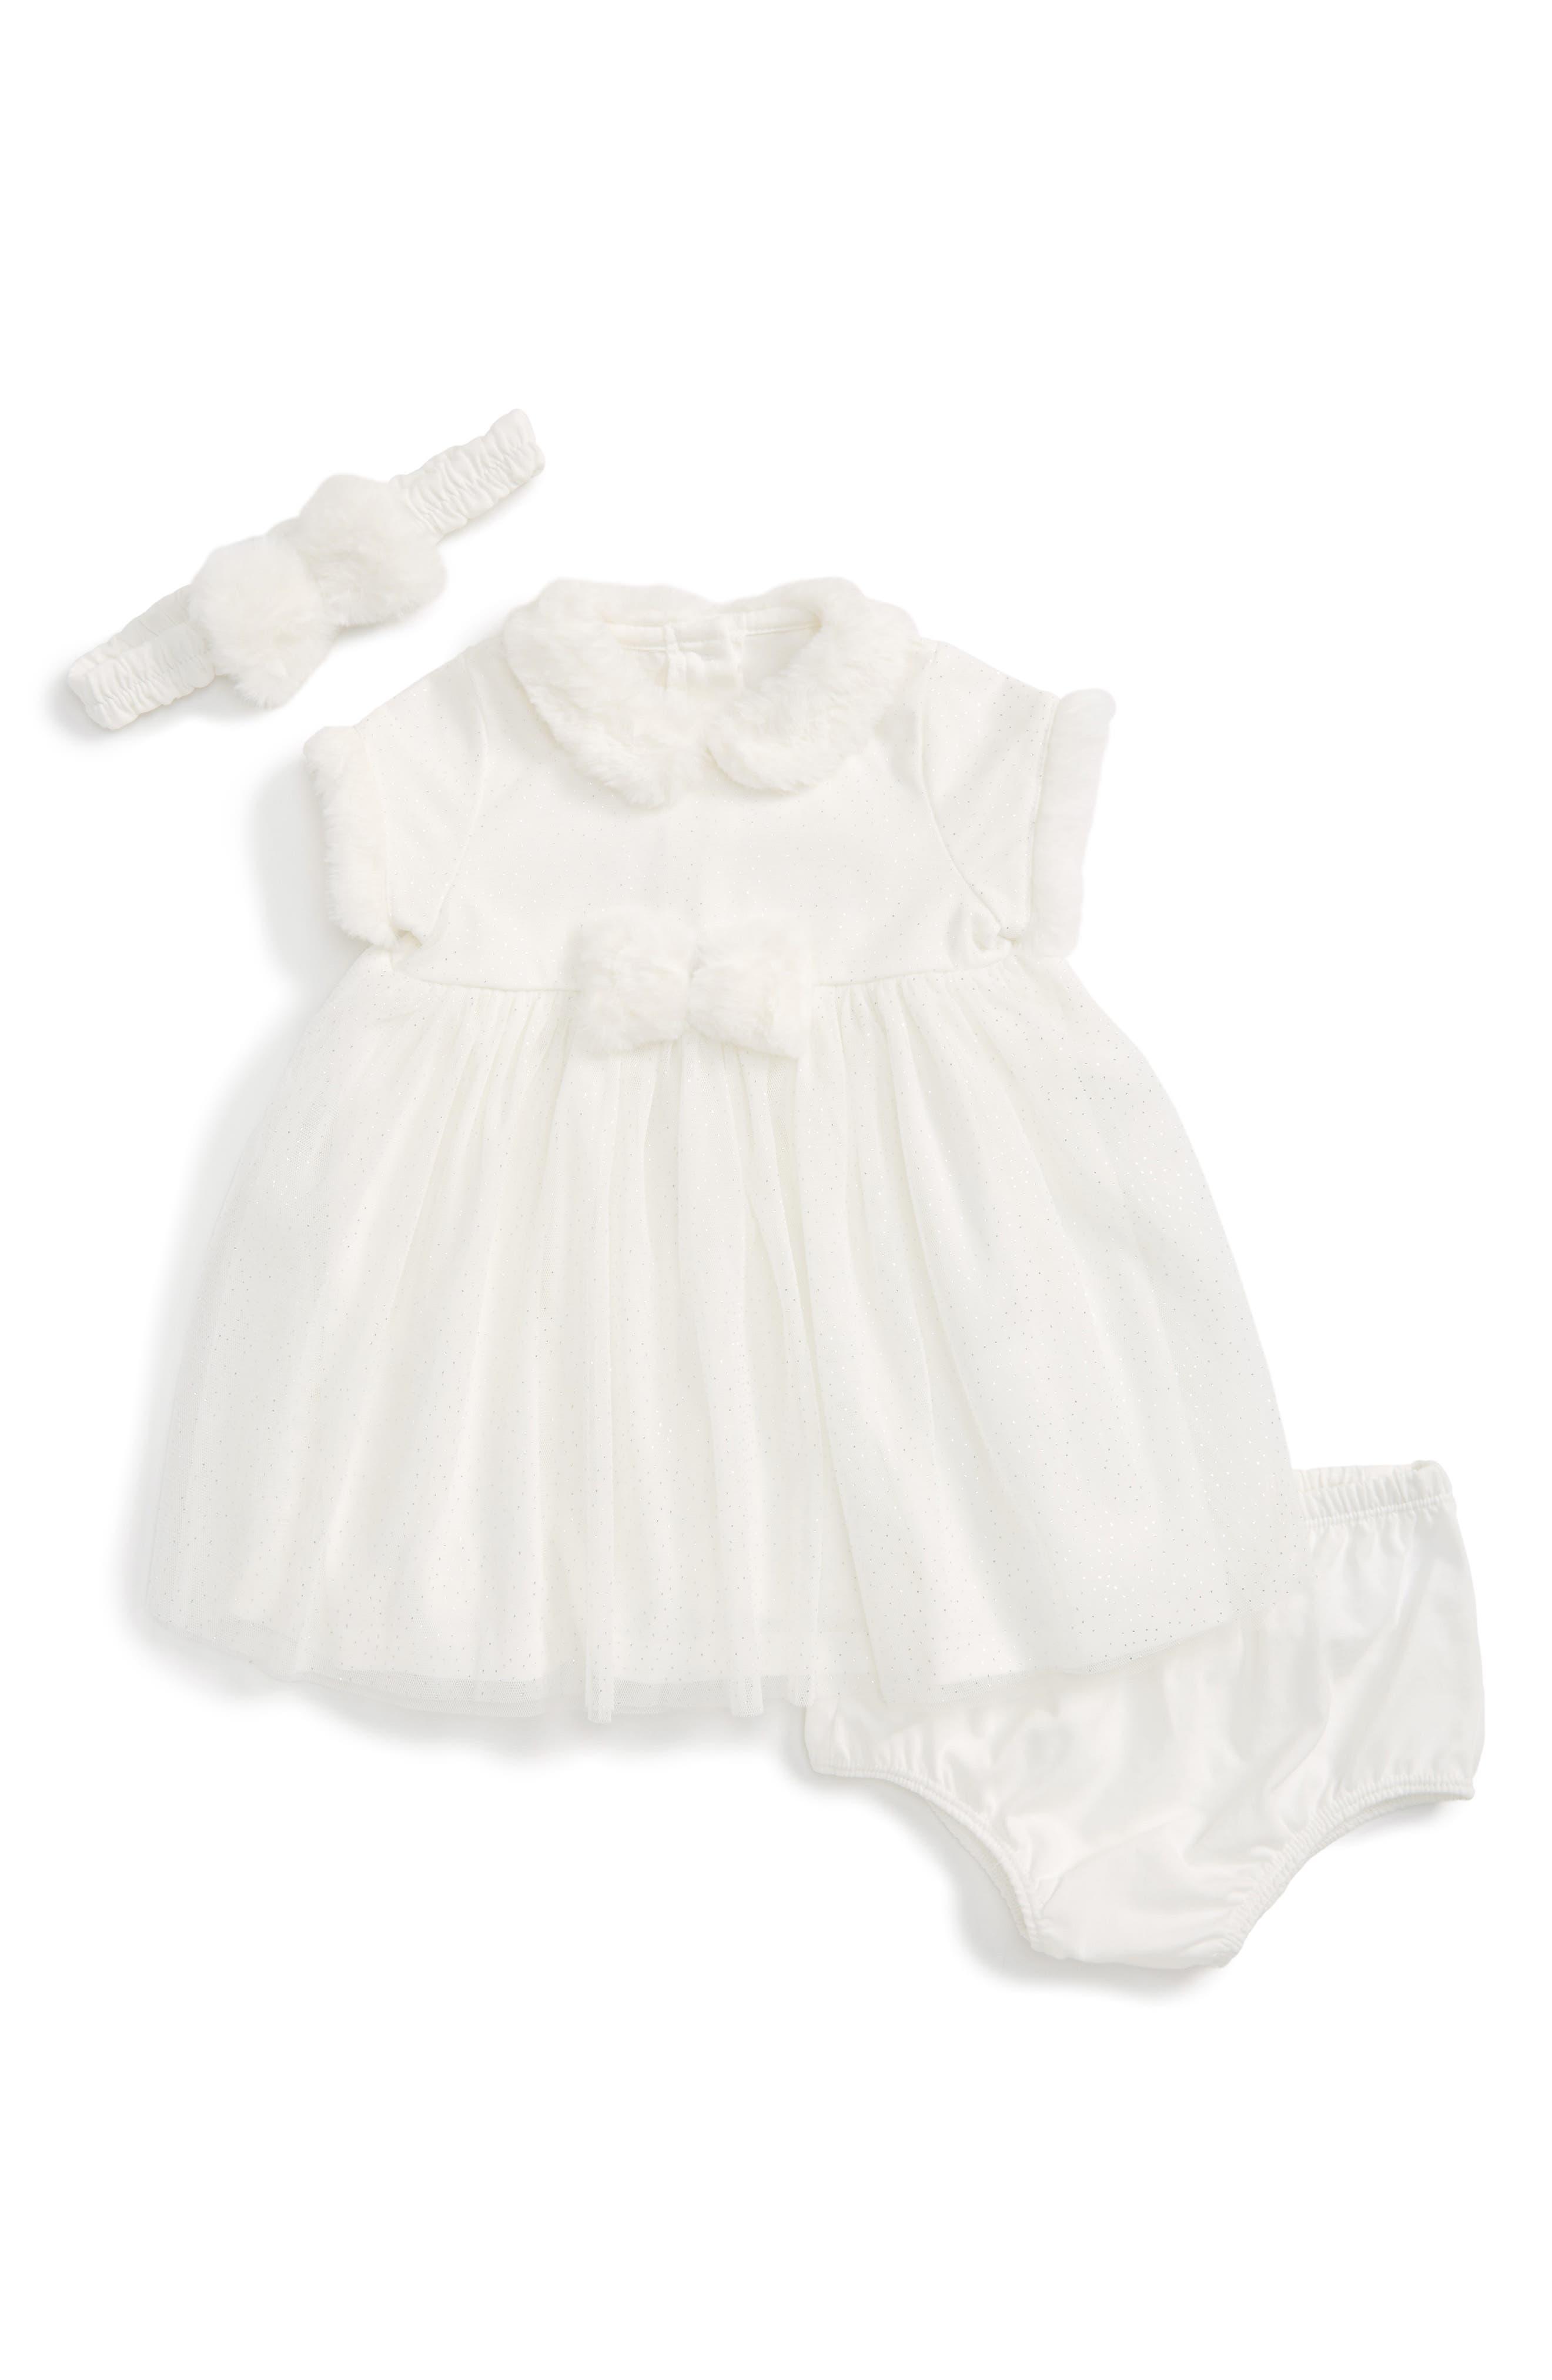 Sparkle Mesh Dress & Headband Set,                             Main thumbnail 1, color,                             900